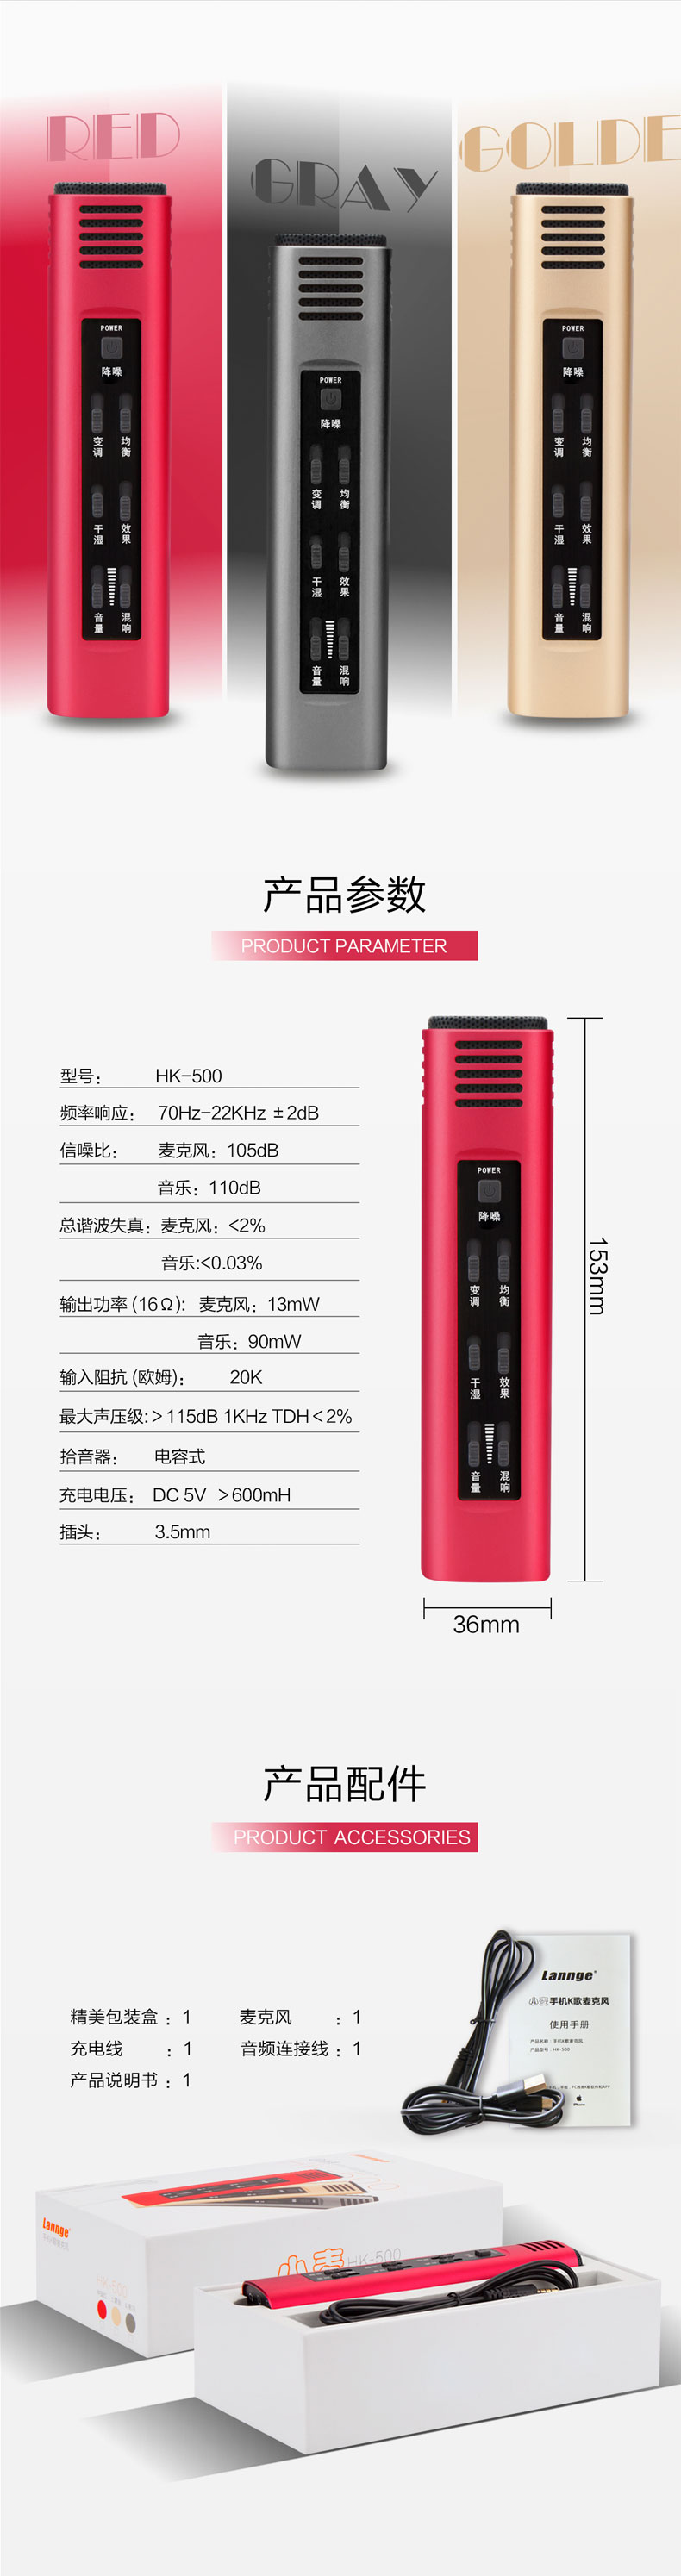 HK-500详情页_17.jpg